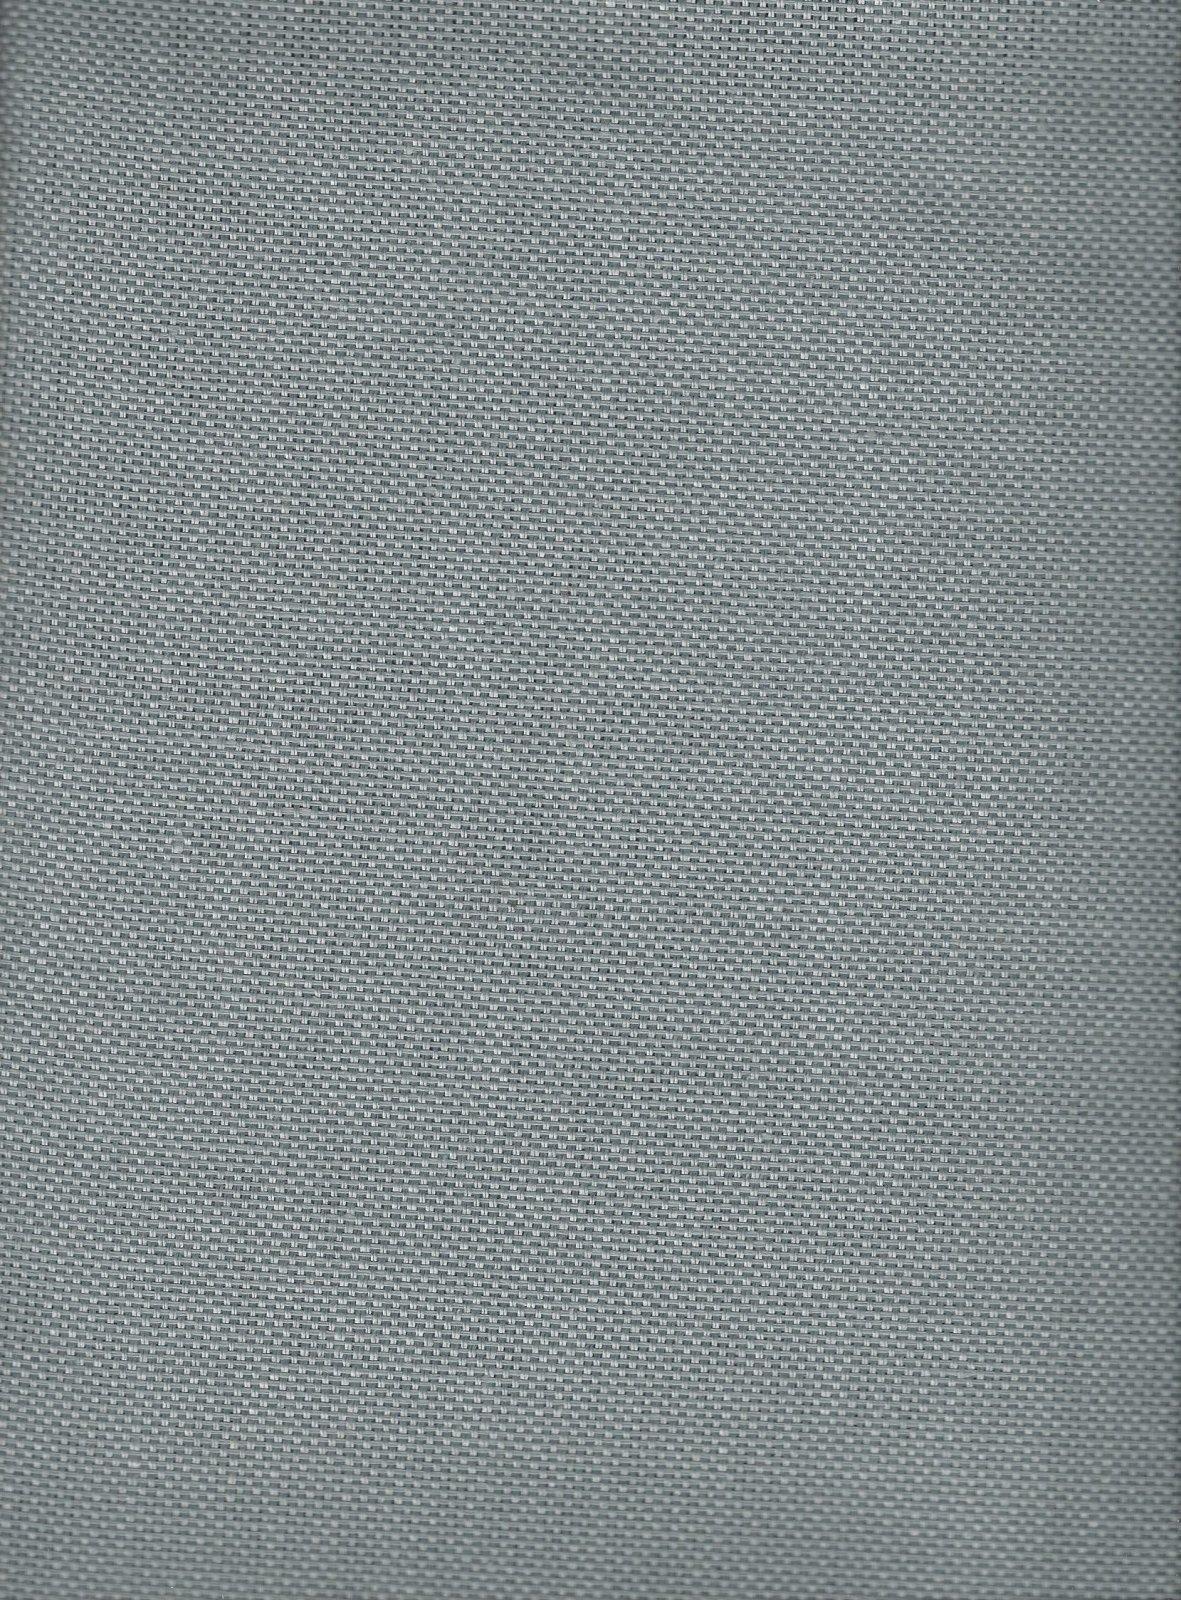 Betsy Ross 16ct Twilight Blue